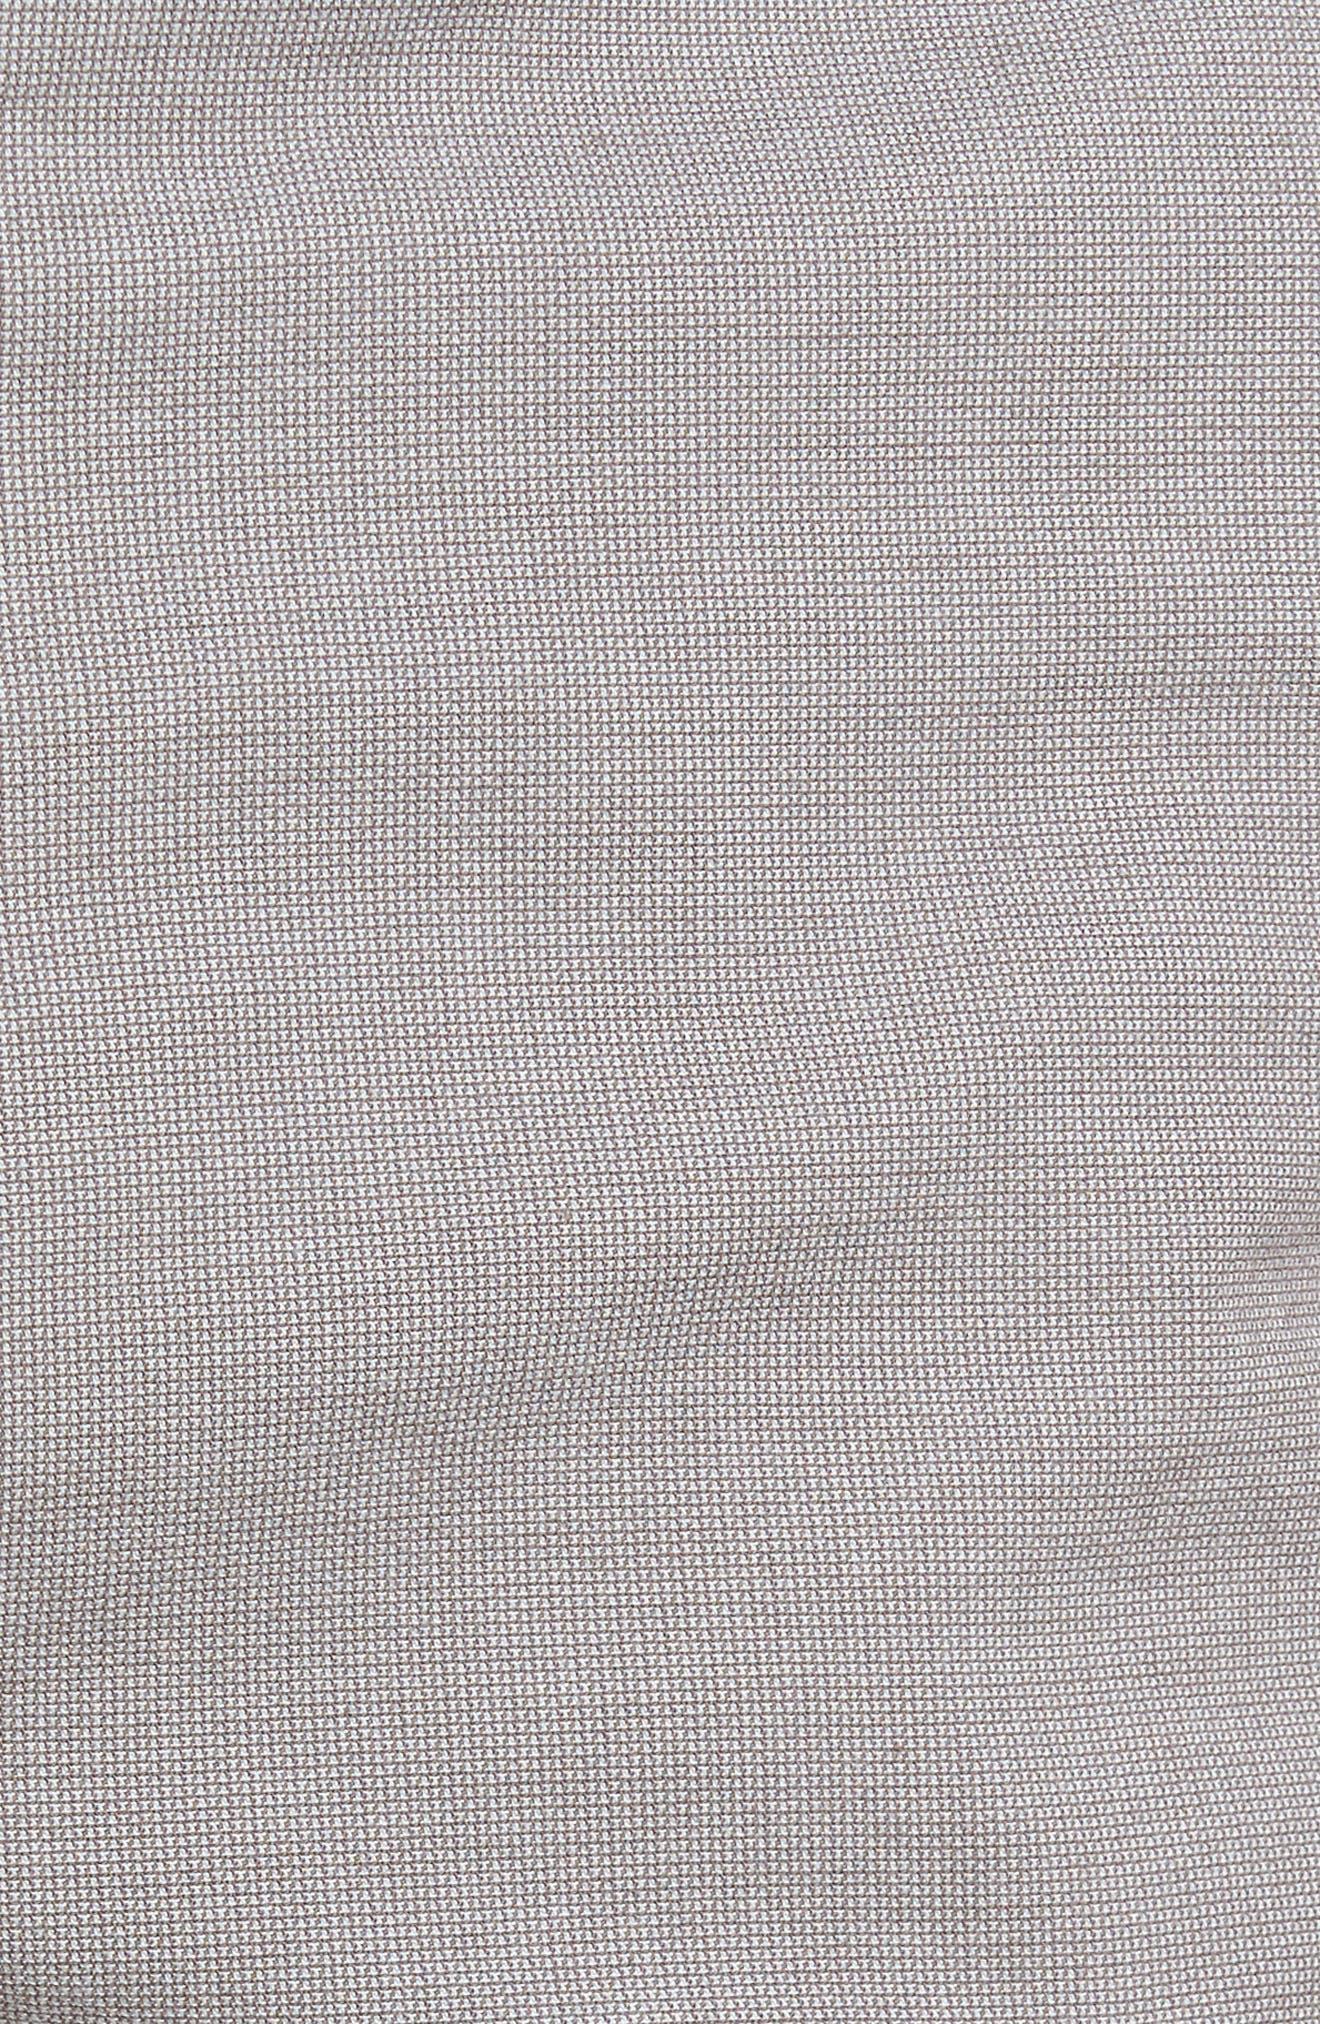 Ludstone Cargo Shorts,                             Alternate thumbnail 5, color,                             053